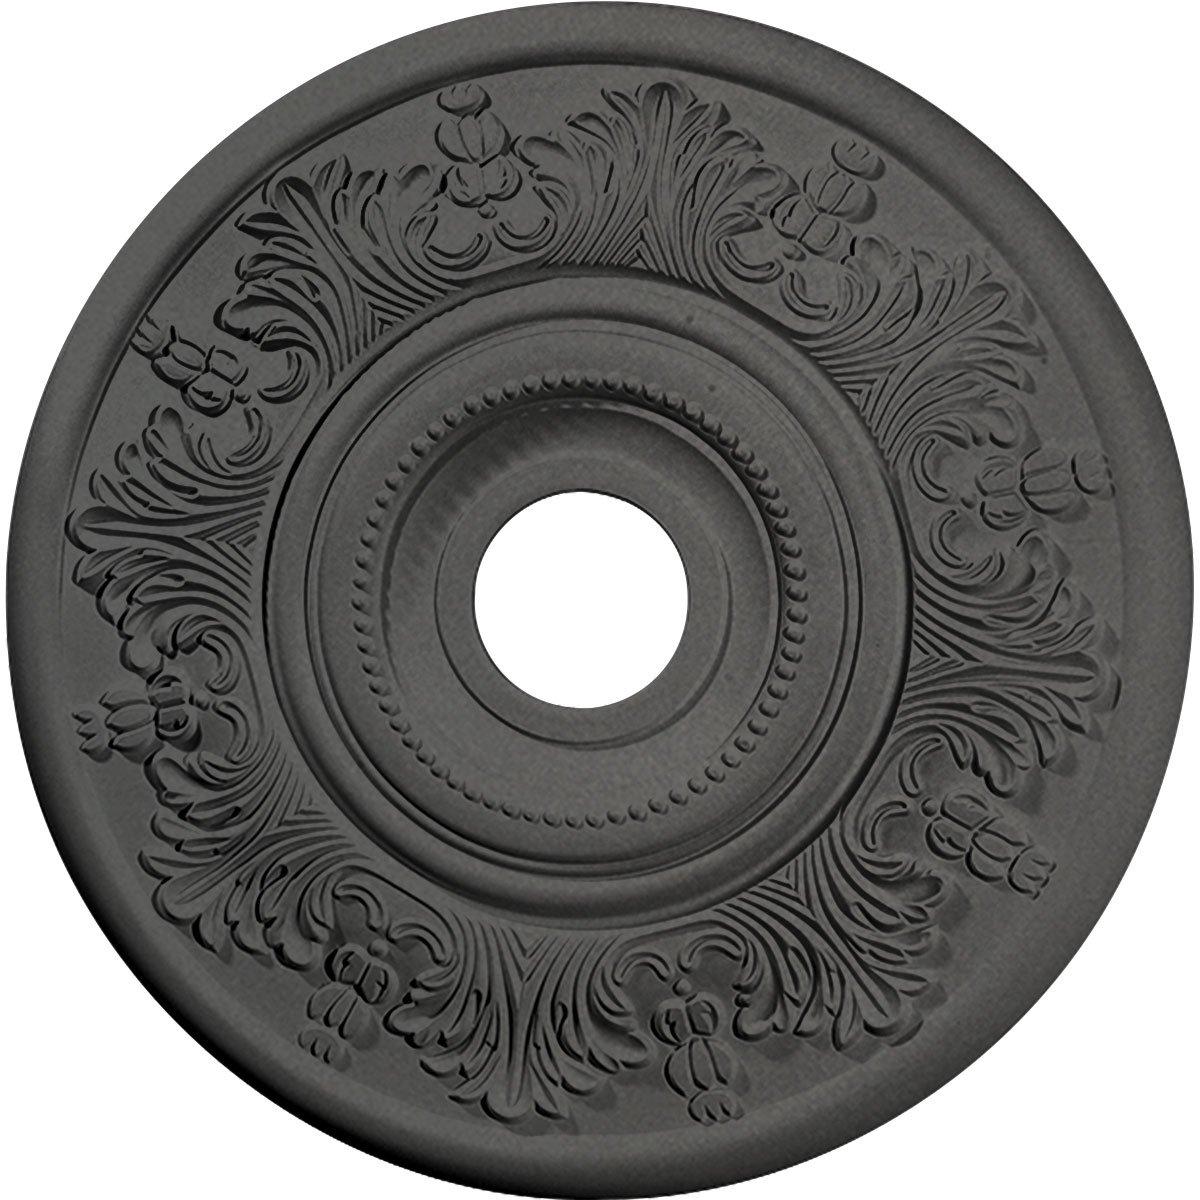 Ekena Millwork CM20VISGS Vienna Ceiling Medallion, 20'' OD x 3 1/2'' ID x 1 1/2'' P, Steel Gray